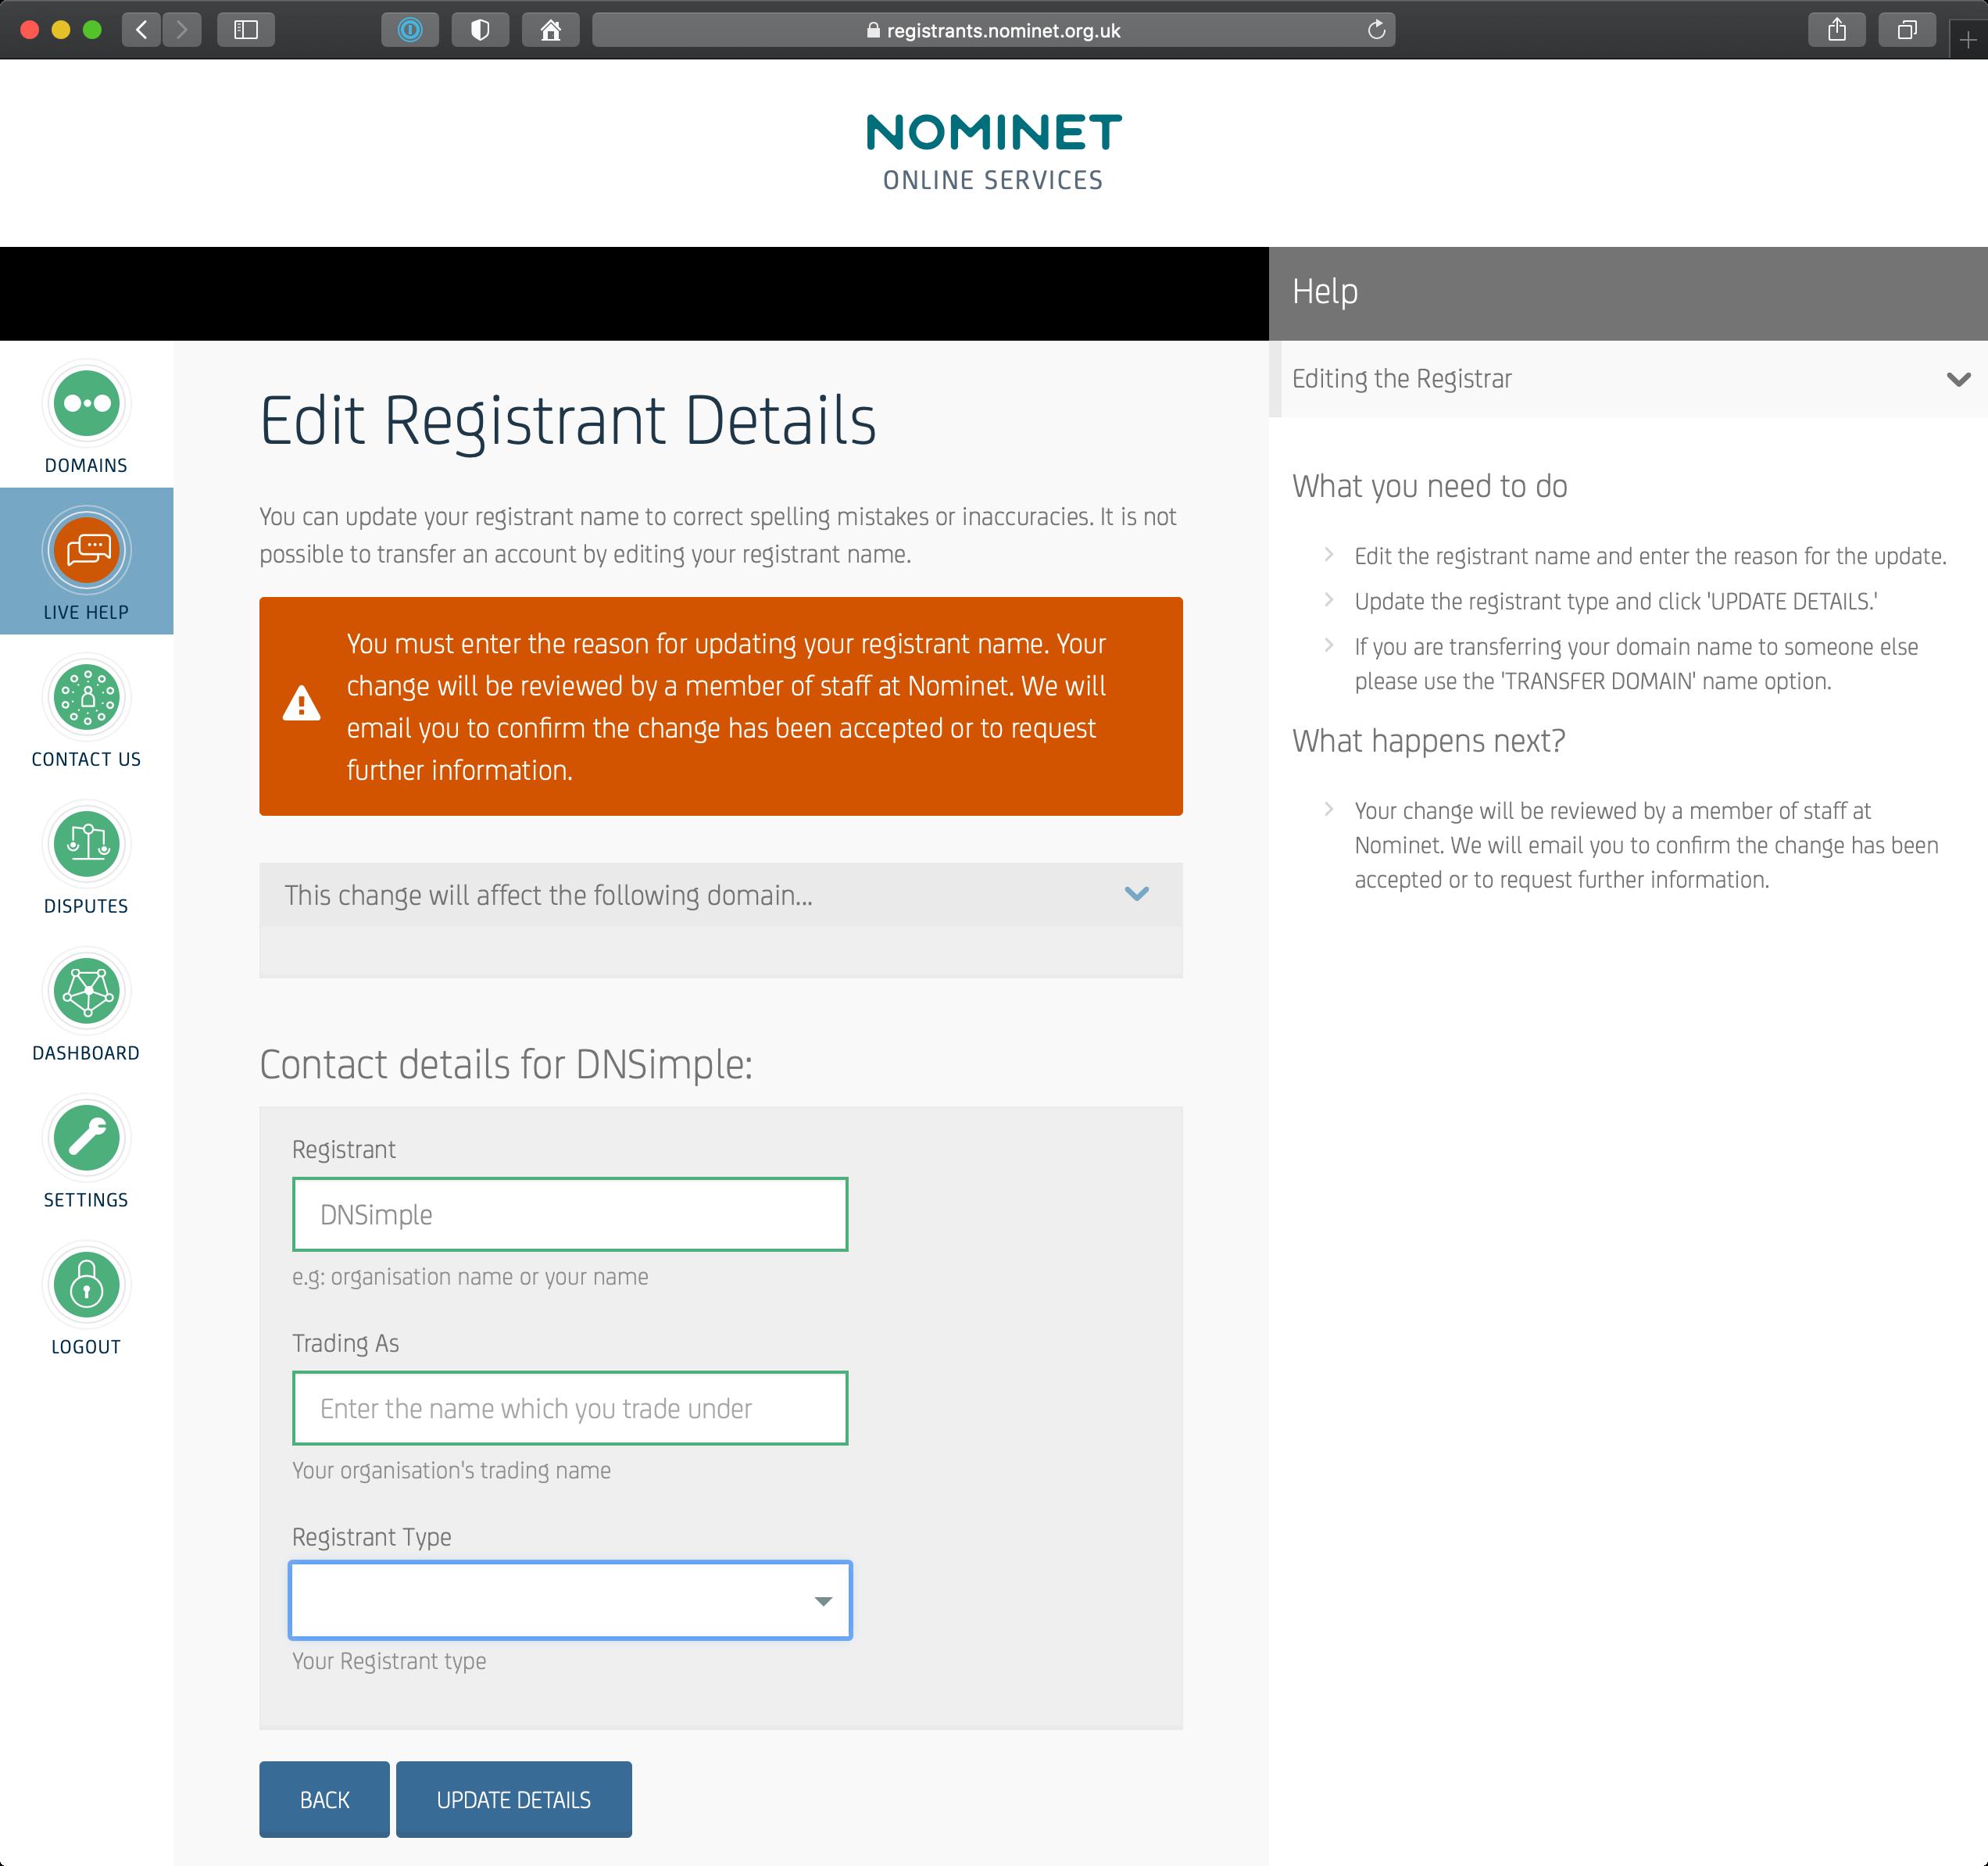 Enter Registrant